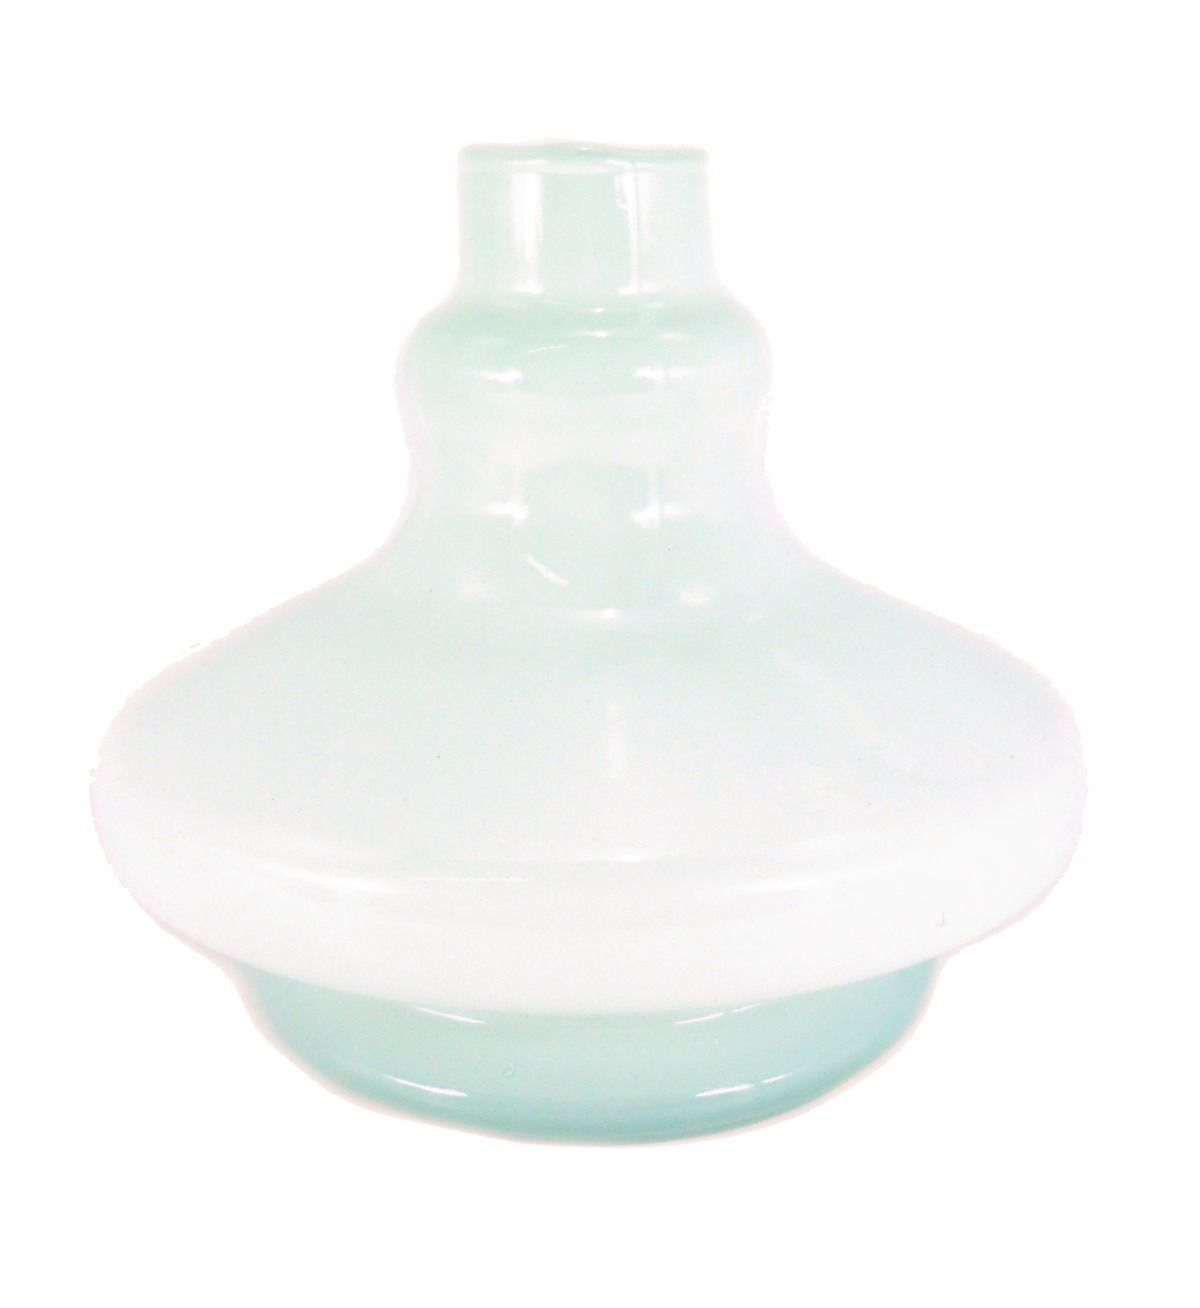 Vaso/base para narguile REI DO NARGUILE em vidro, formato ALADIN (14cm alt.). 3,8cm diâmetro bocal. Branco